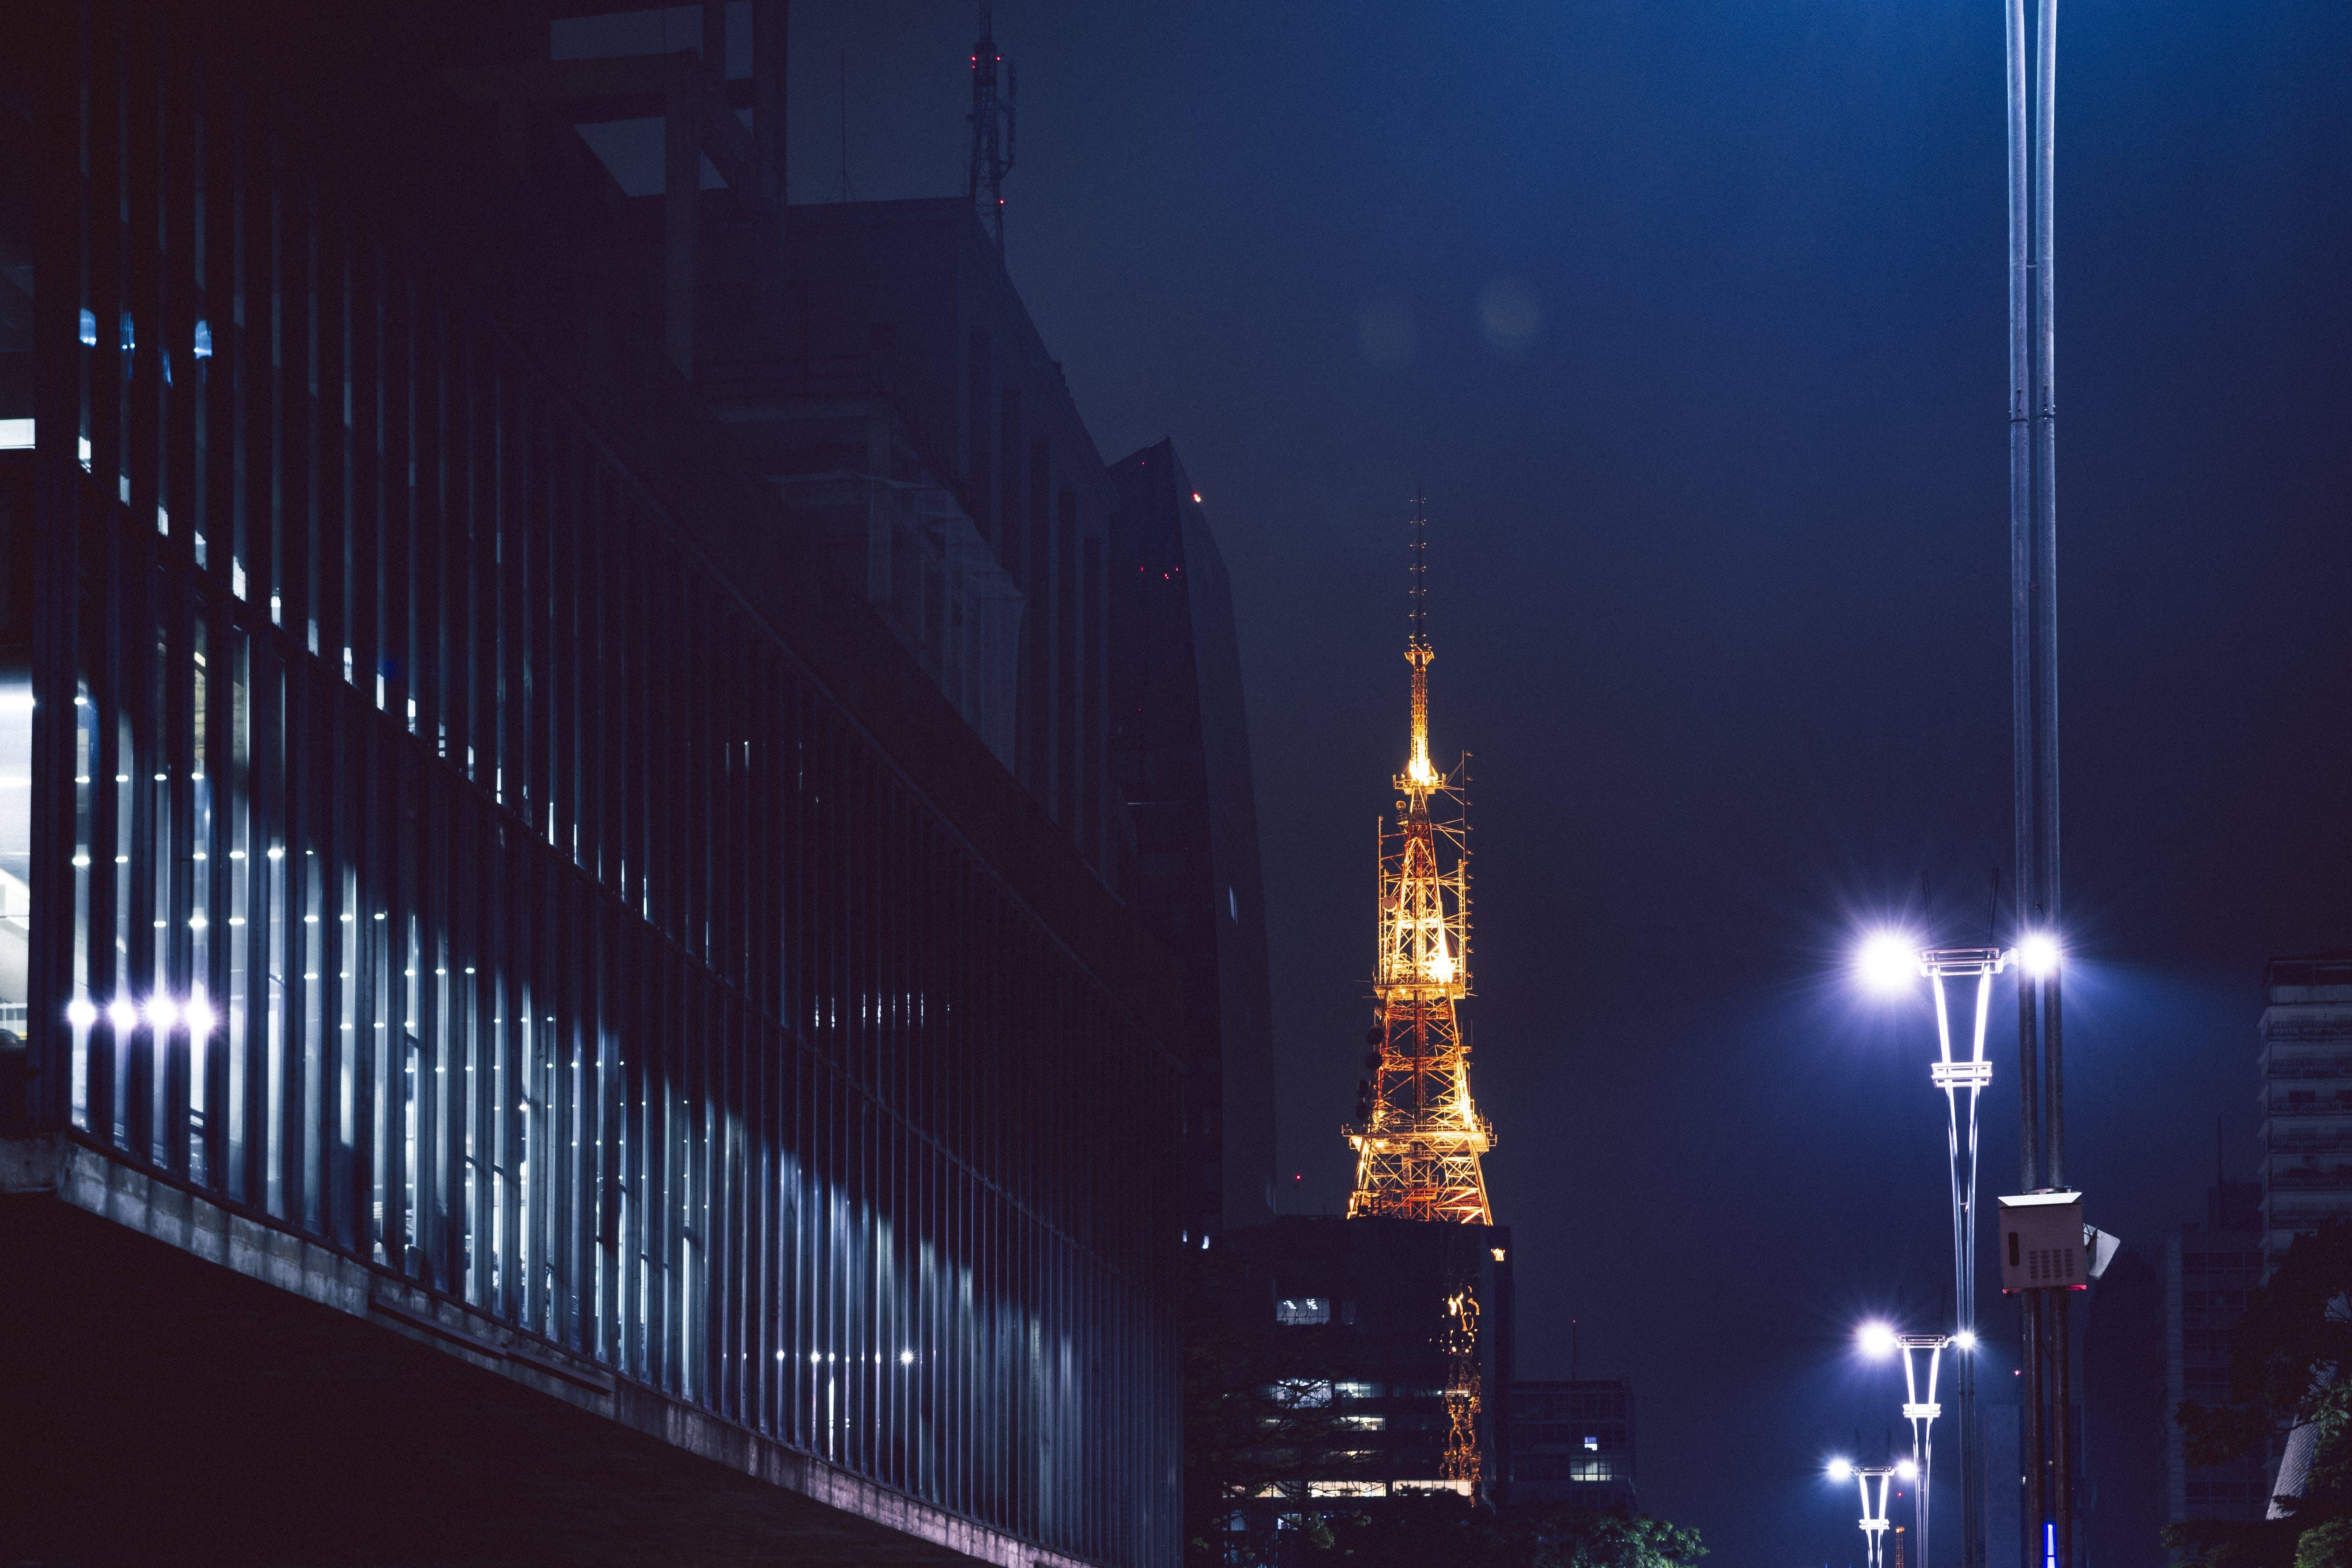 Eiffel Tower, Paris during Night Time